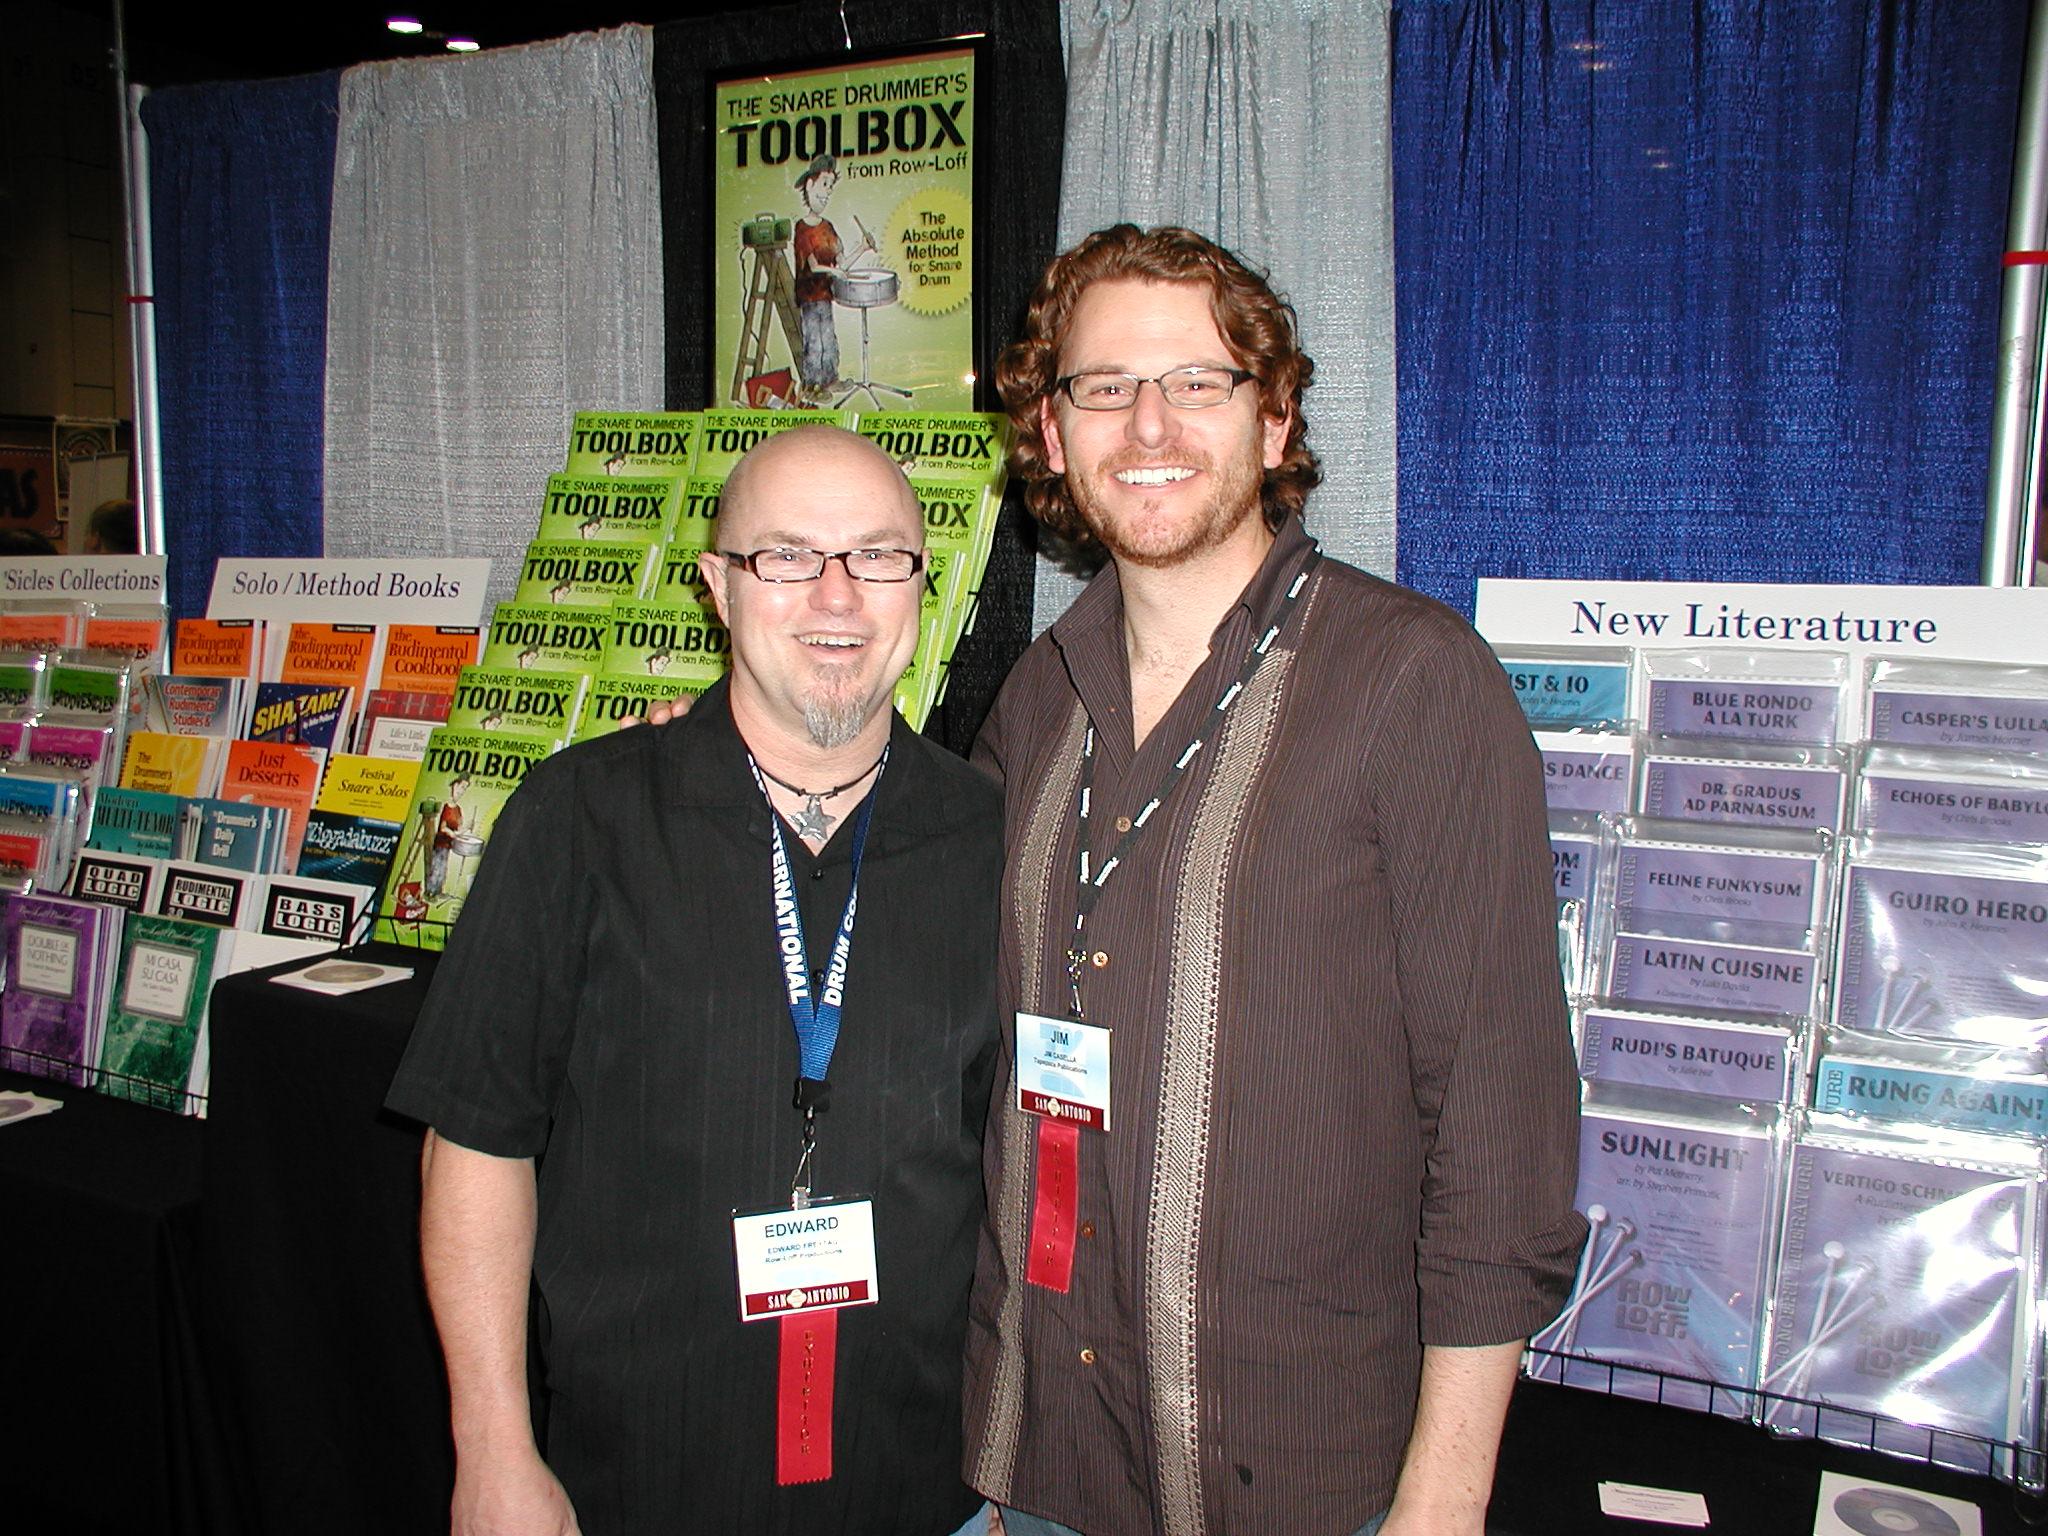 Edward and Jim Casella, 2010